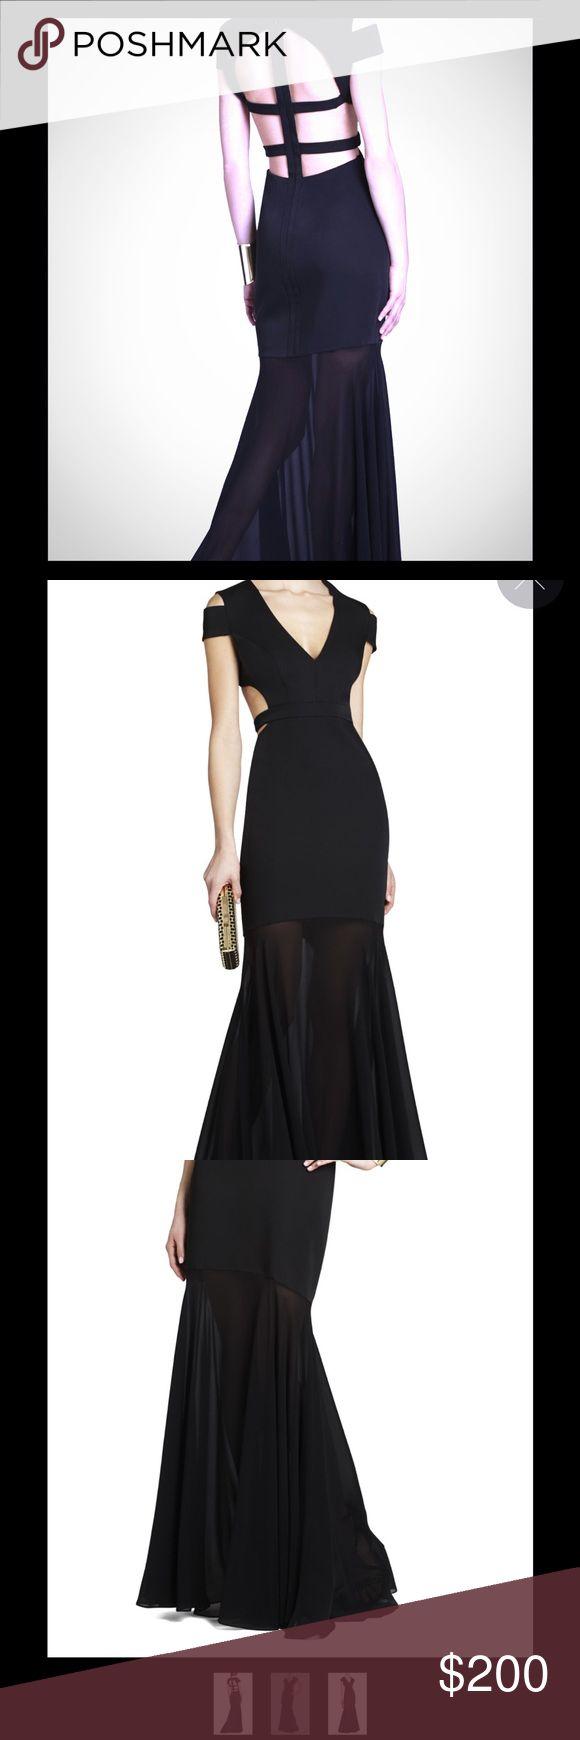 "⭐️ FINAL SALE ⭐️ BCBG MAXAZRIA ""Ava"" Cutout Gown BCBG MAXAZRIA ""Ava"" Cut out Gown still for sell on site. Shown above worn by Nina Debrov (Vampire Diaries) MAKE OFFERS BCBGMaxAzria Dresses Maxi"